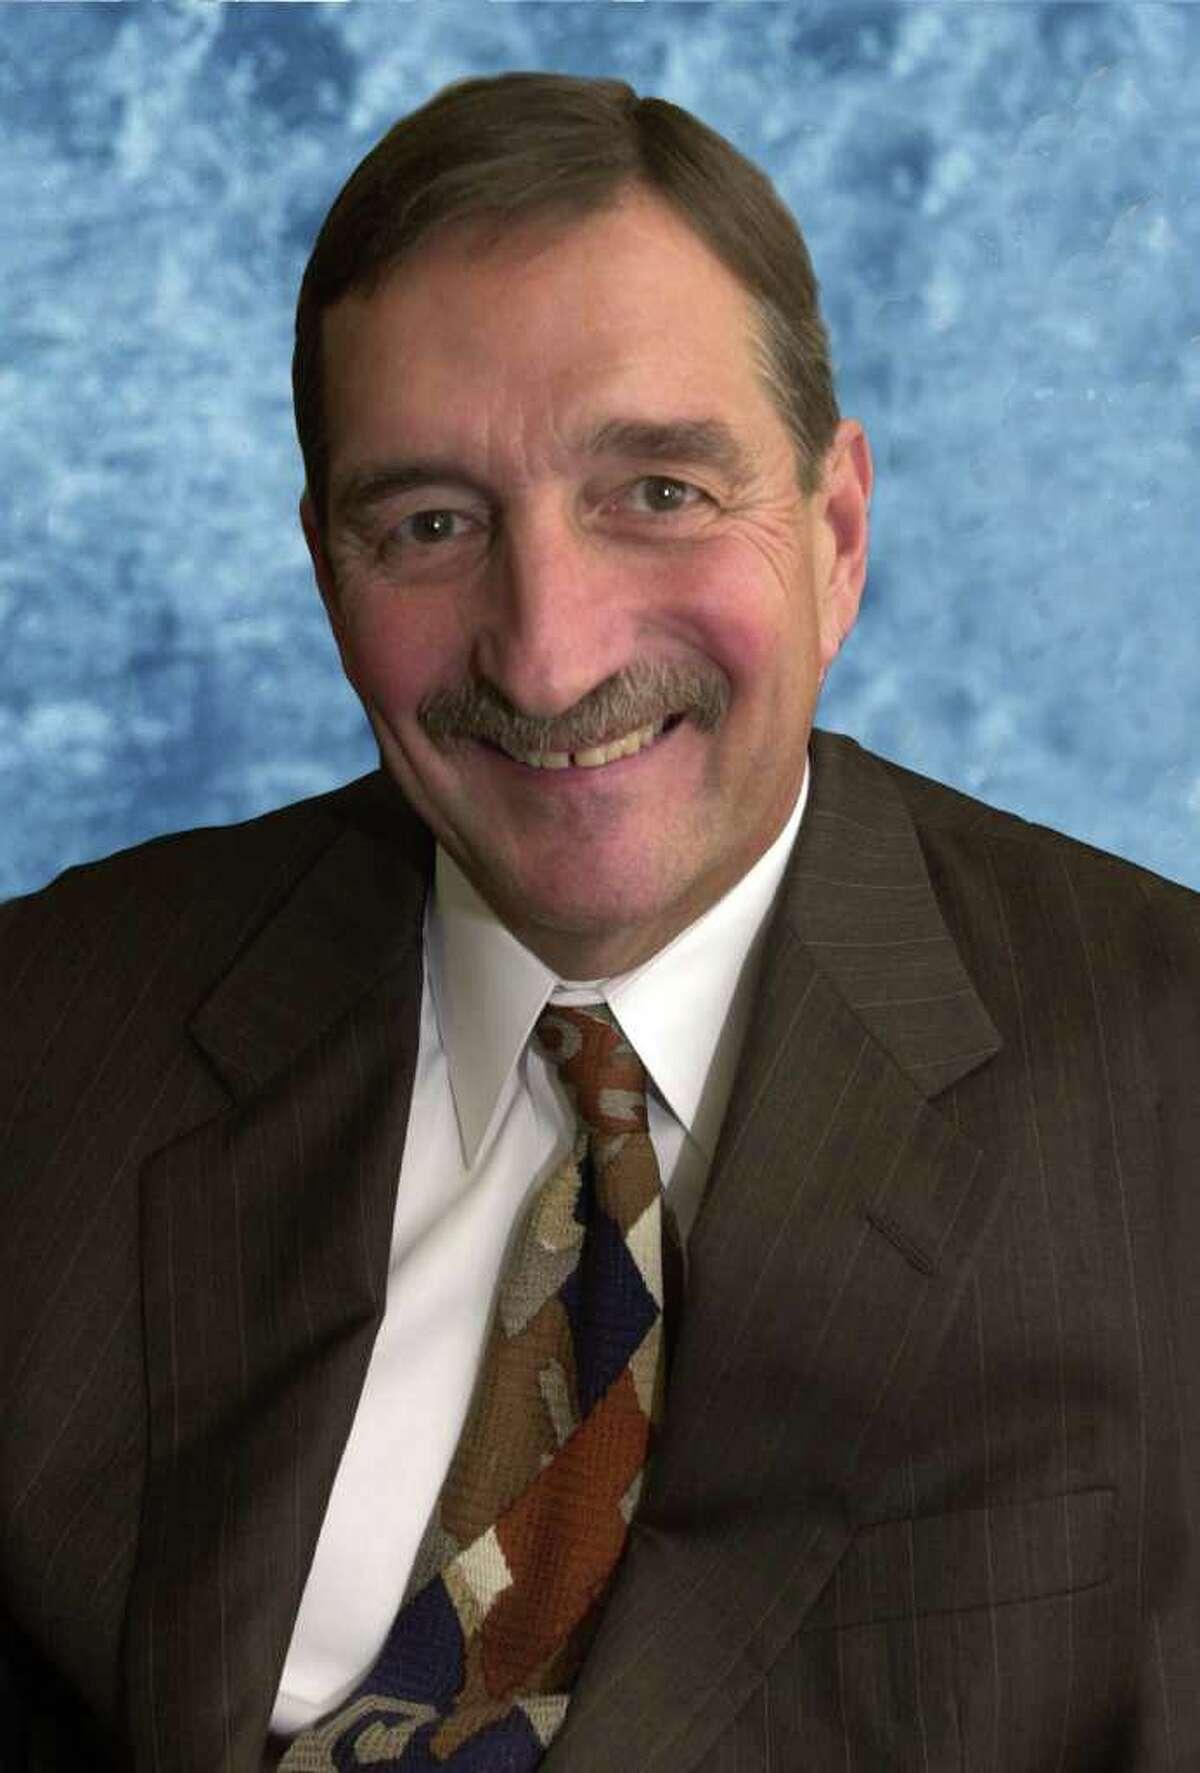 Thomas Mesenbourg is deputy director of the U.S. Census Bureau.